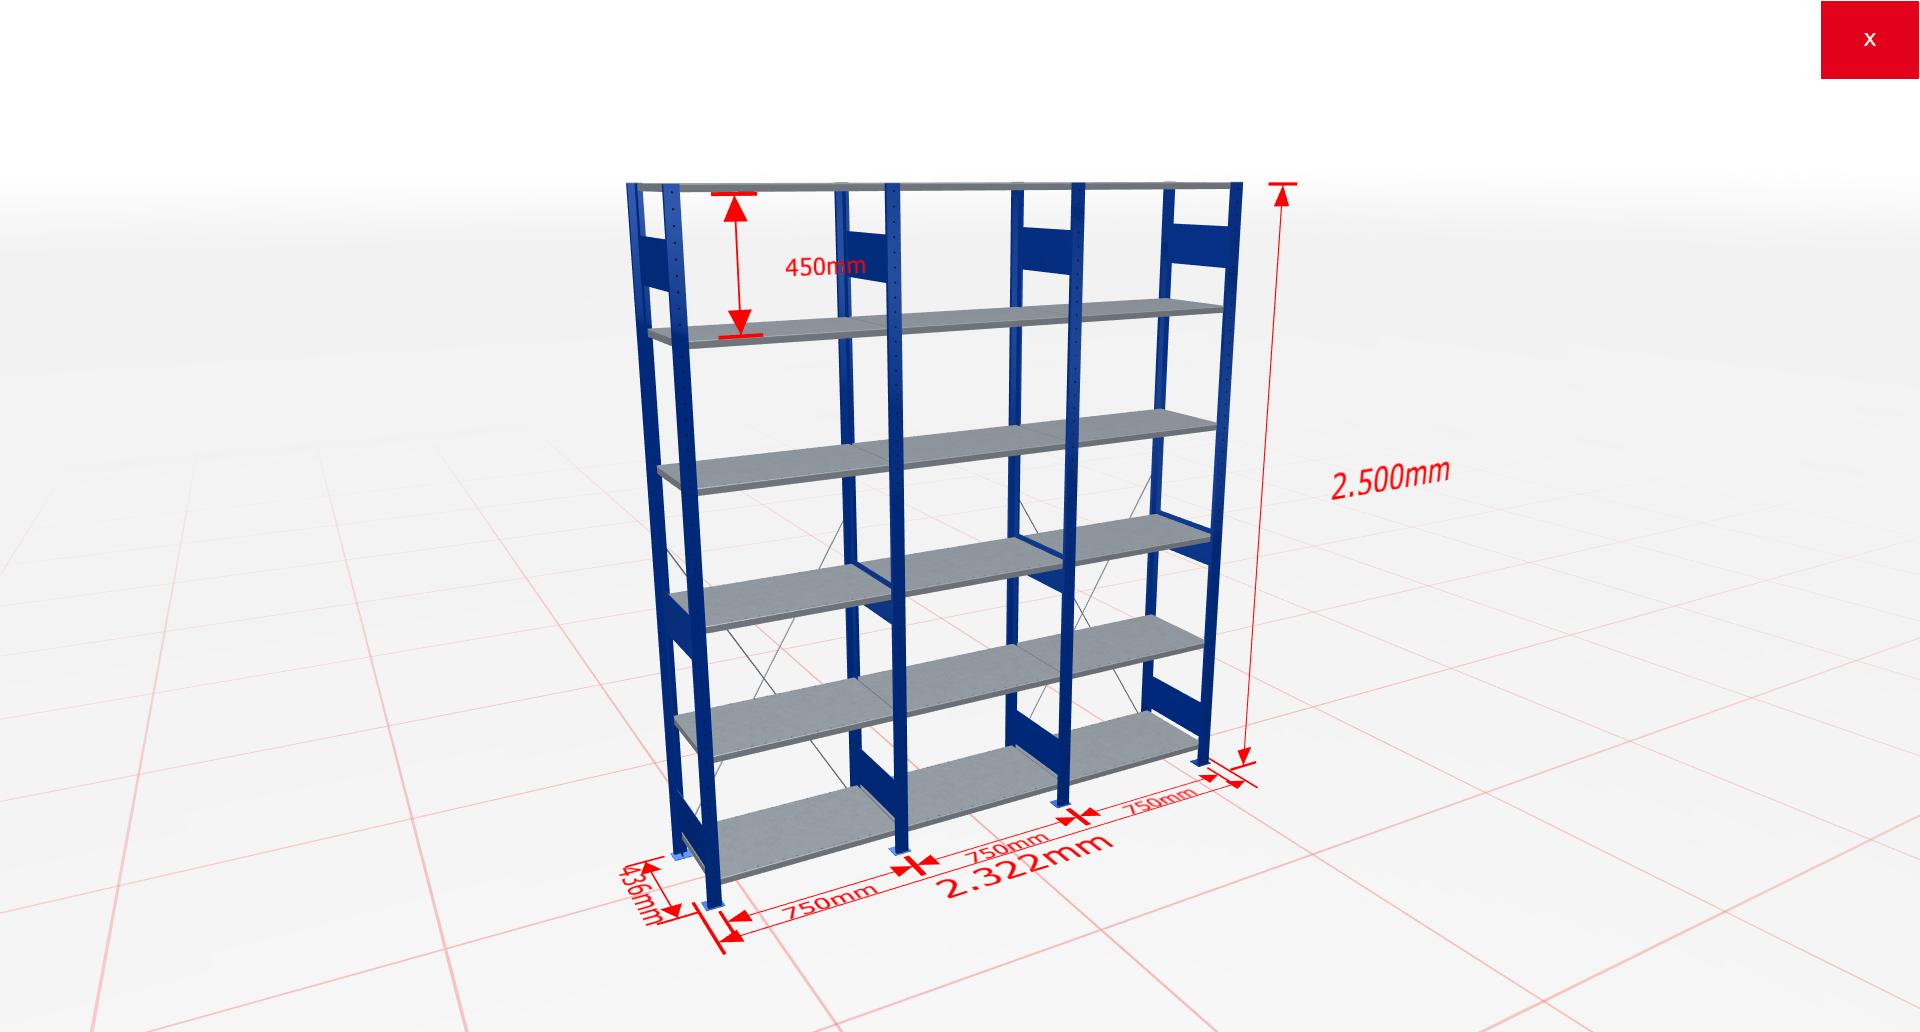 Fachbodenregal Komplettregal 2500x2322x400 mm (HxBxT) SCHULTE Lagertechnik blau 6 Ebenen  150 kg je Boden